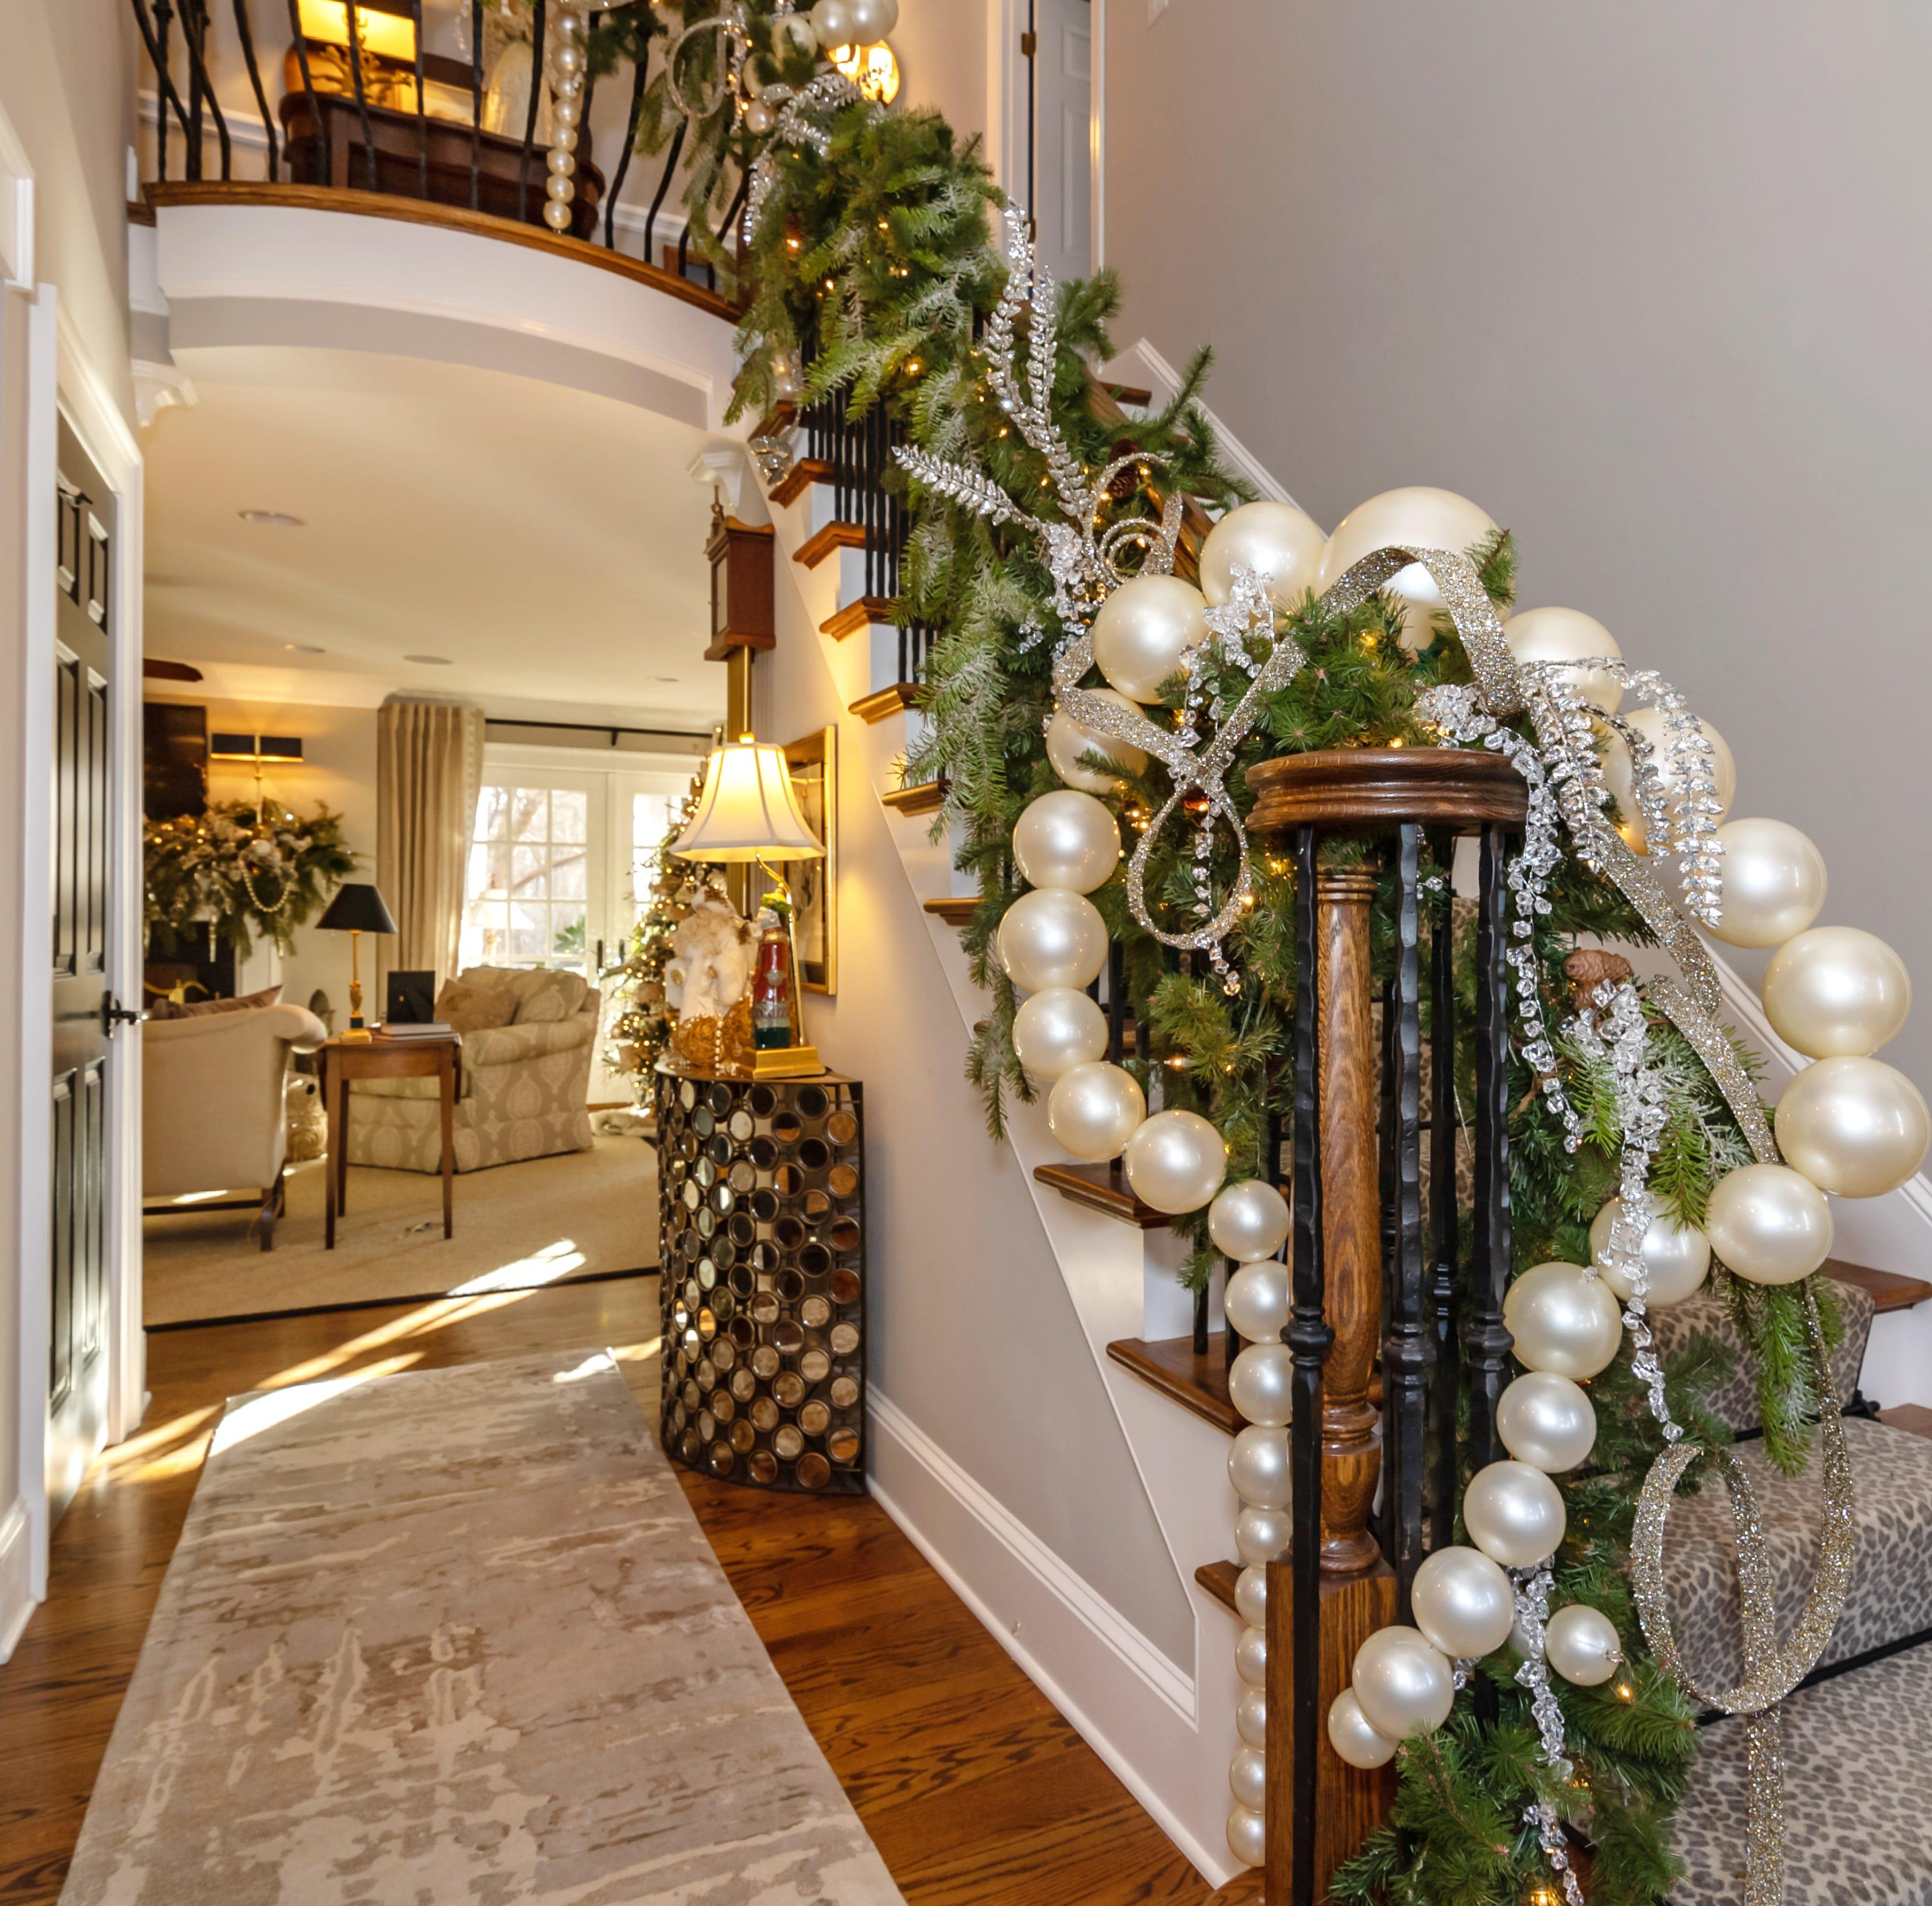 TALK Homes with Elaine and Bill Sarratt in December